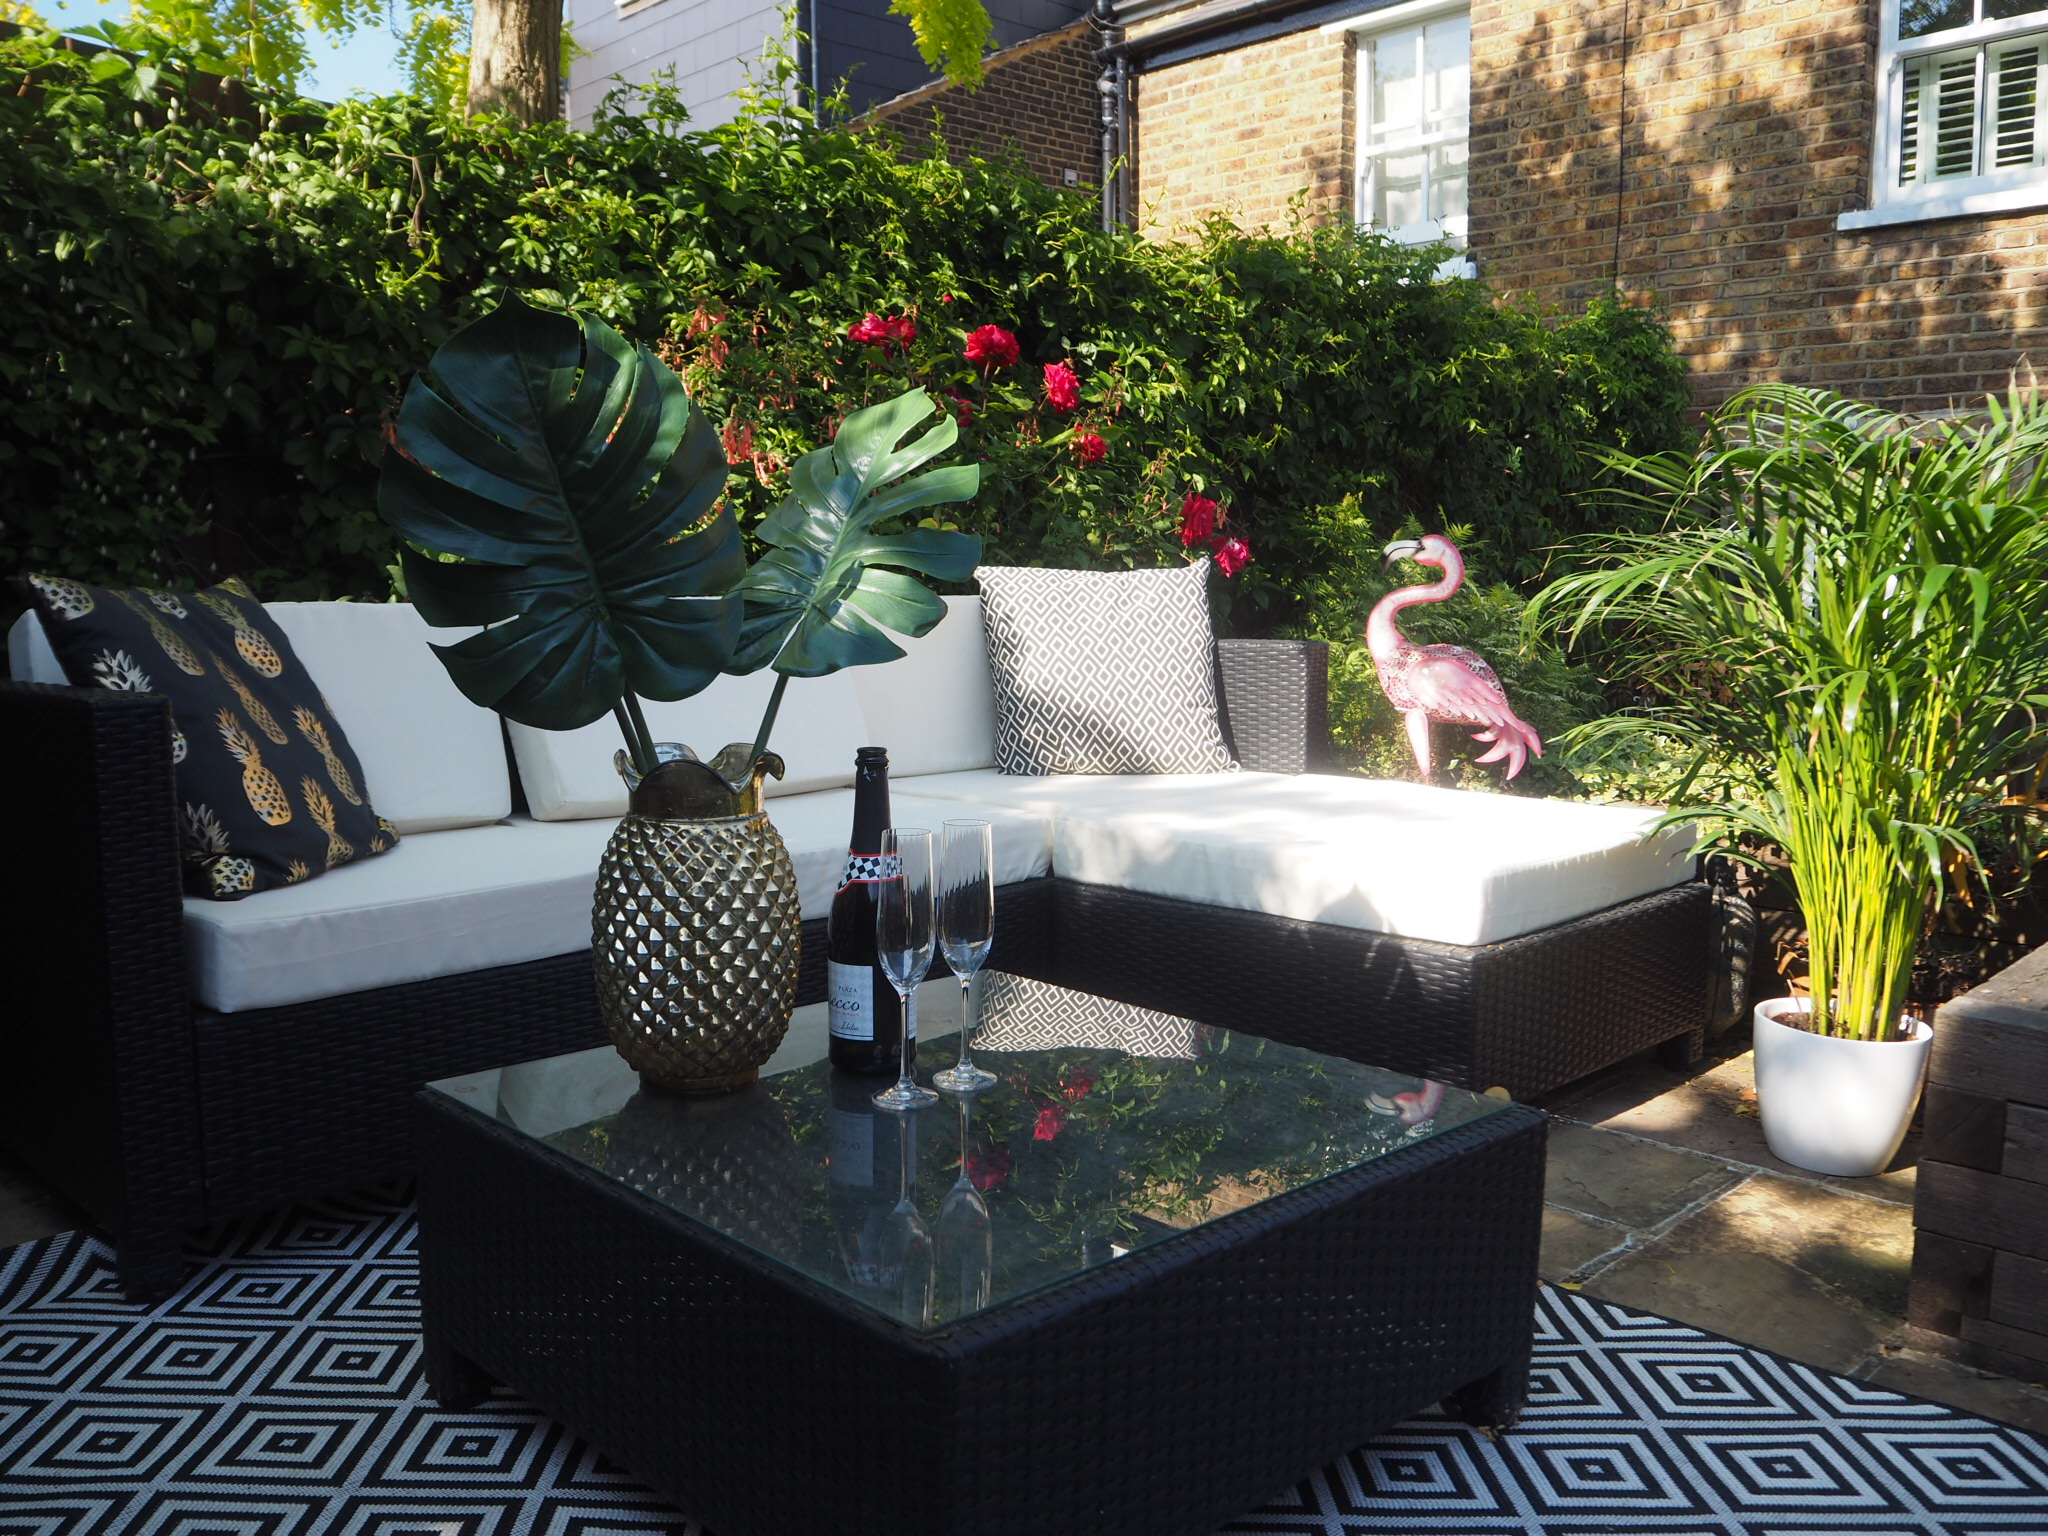 Indoors outdoors! Our garden with garden rug and garden cushions.